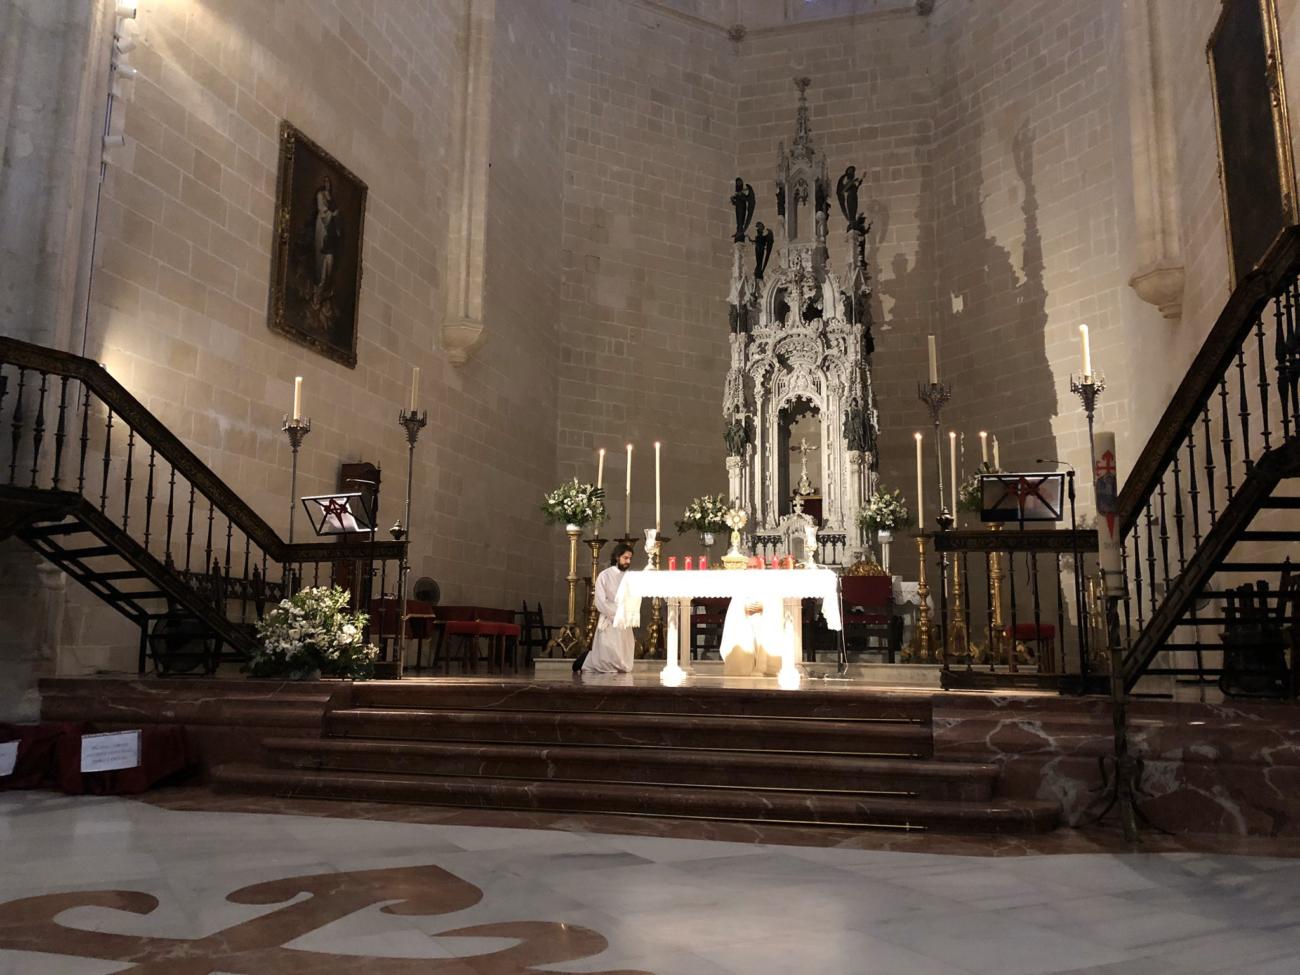 Hora Santa – Sacramental Santiago